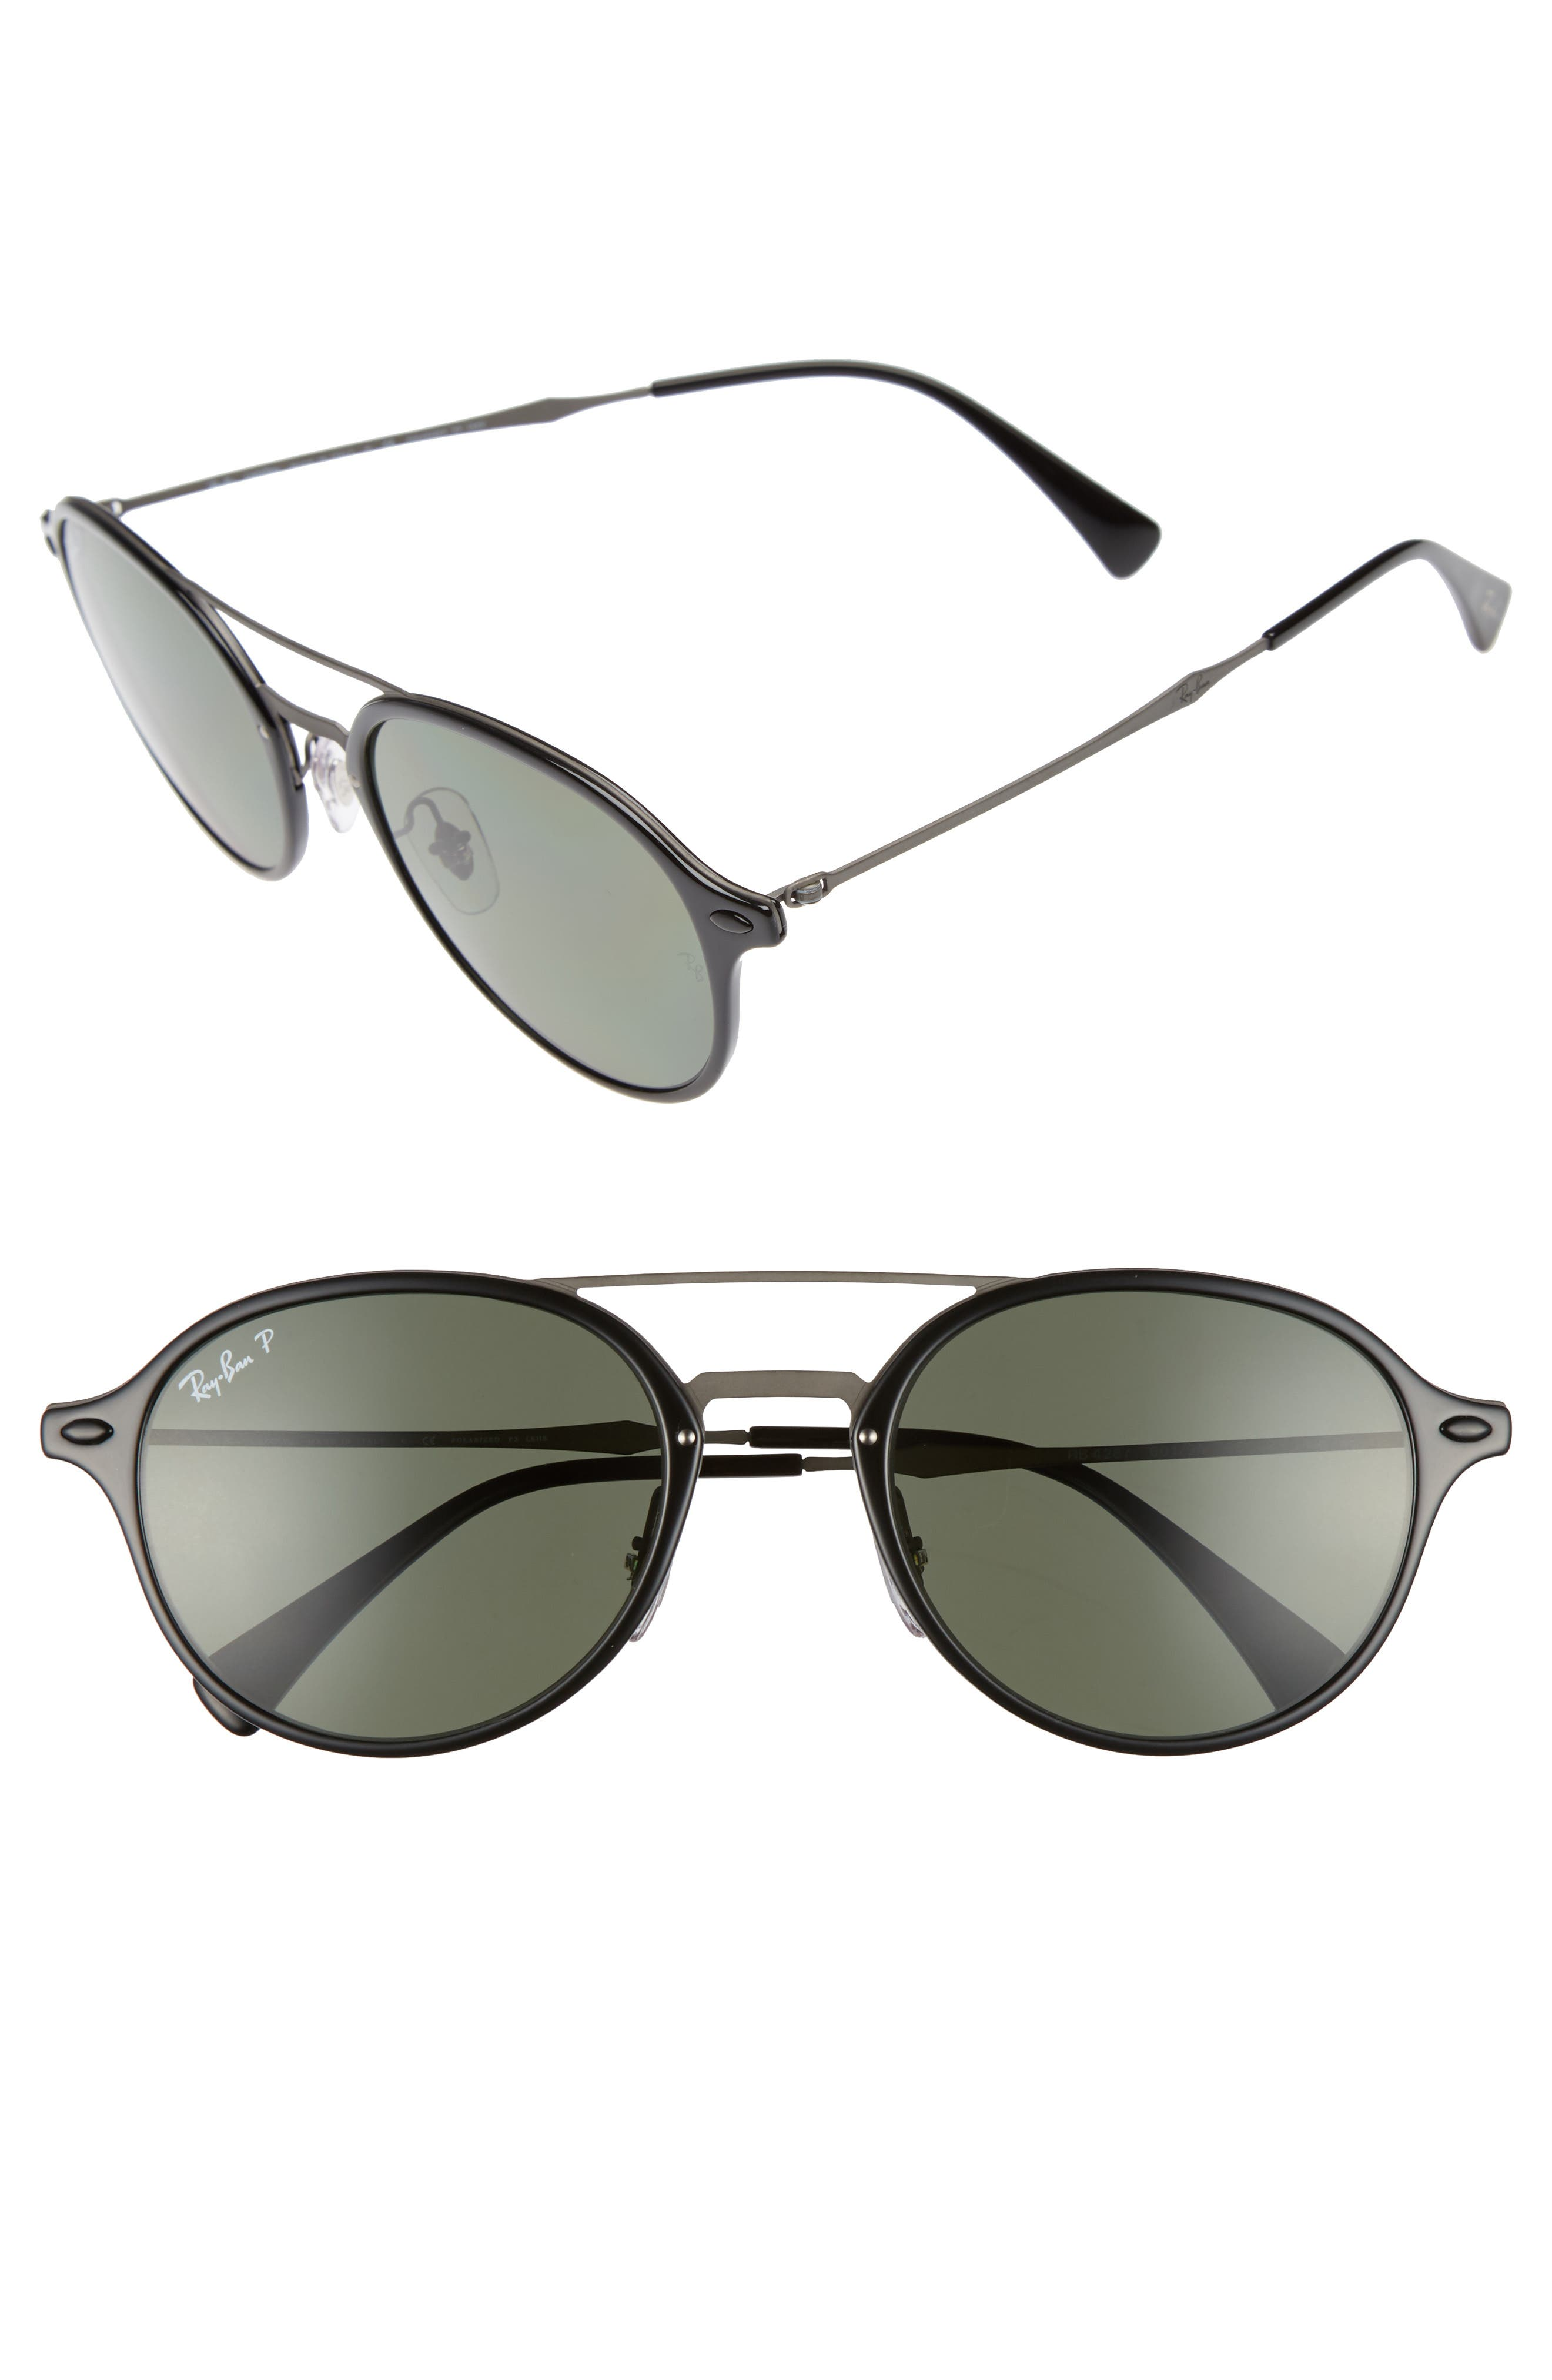 55mm Aviator Sunglasses,                         Main,                         color, 001